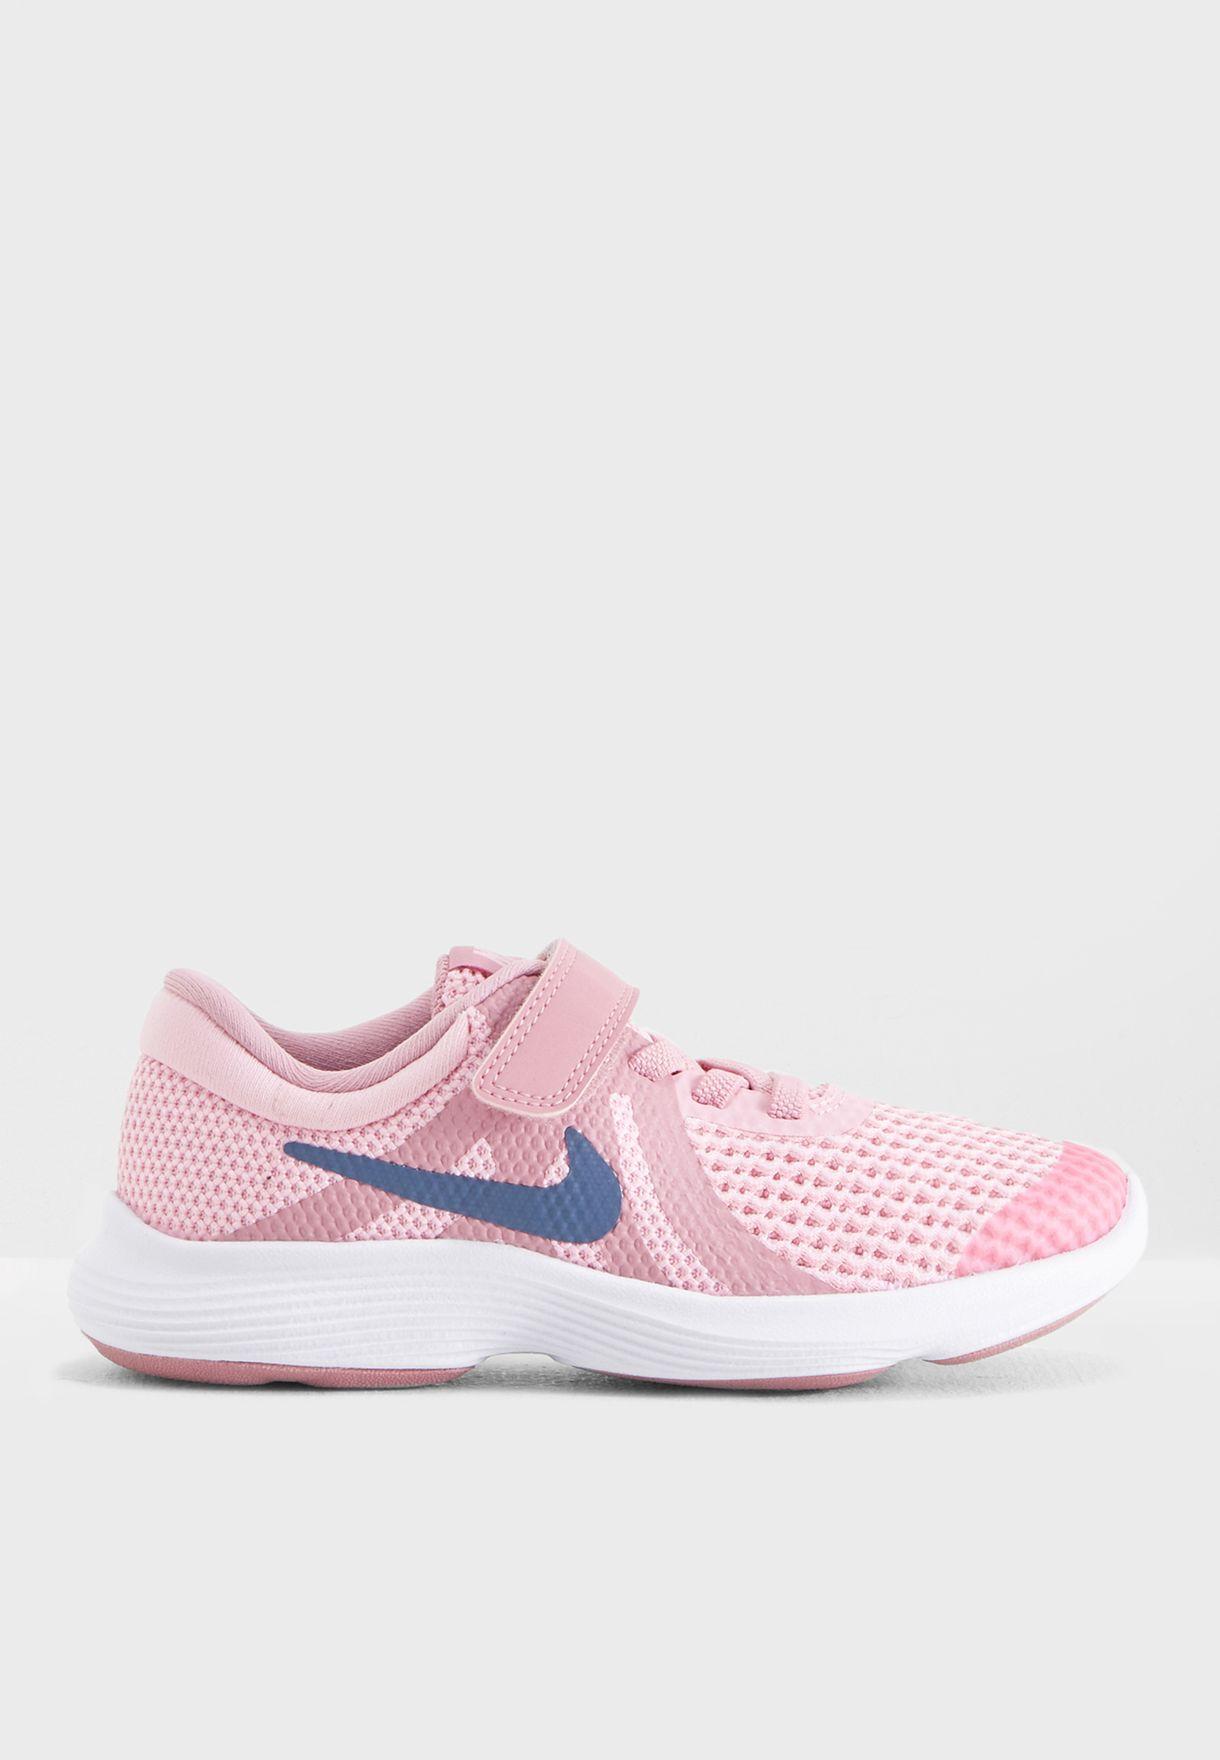 051f3fada تسوق حذاء ريفولوشن 4 للاطفال ماركة نايك لون وردي 943307-602 في عمان ...